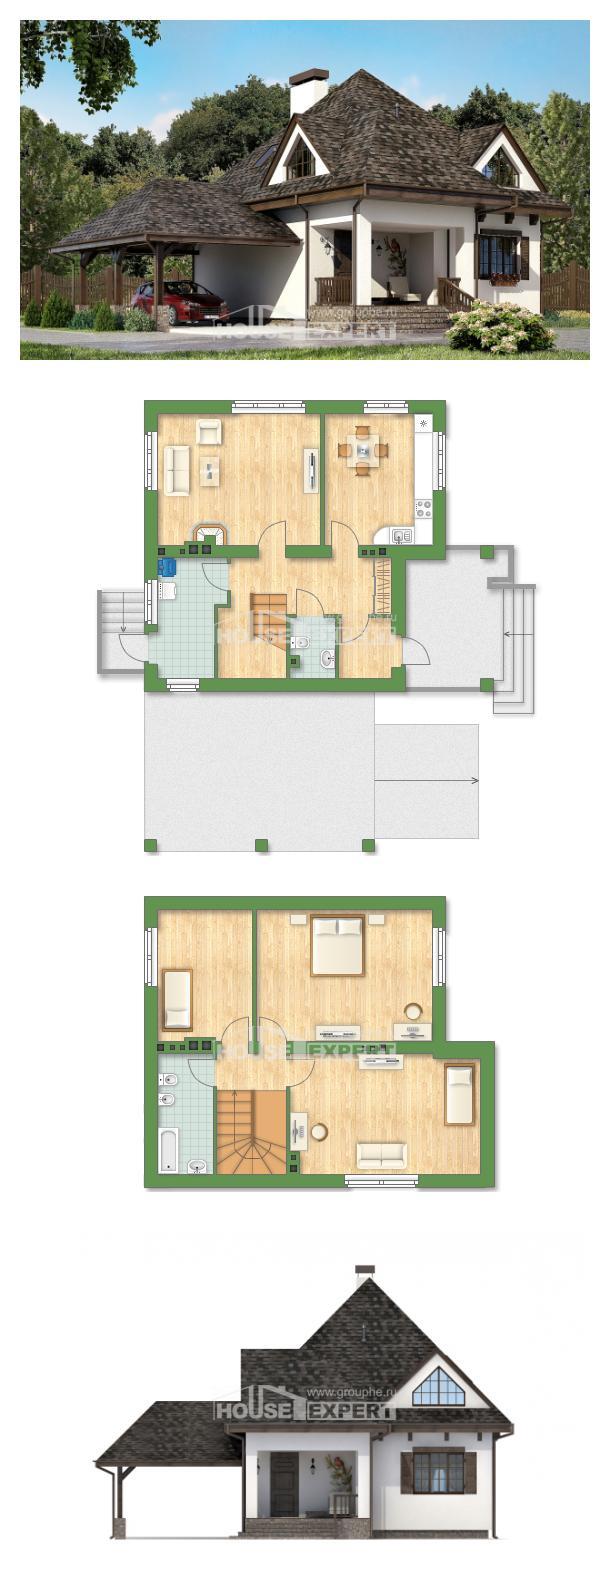 Проект дома 110-002-Л   House Expert